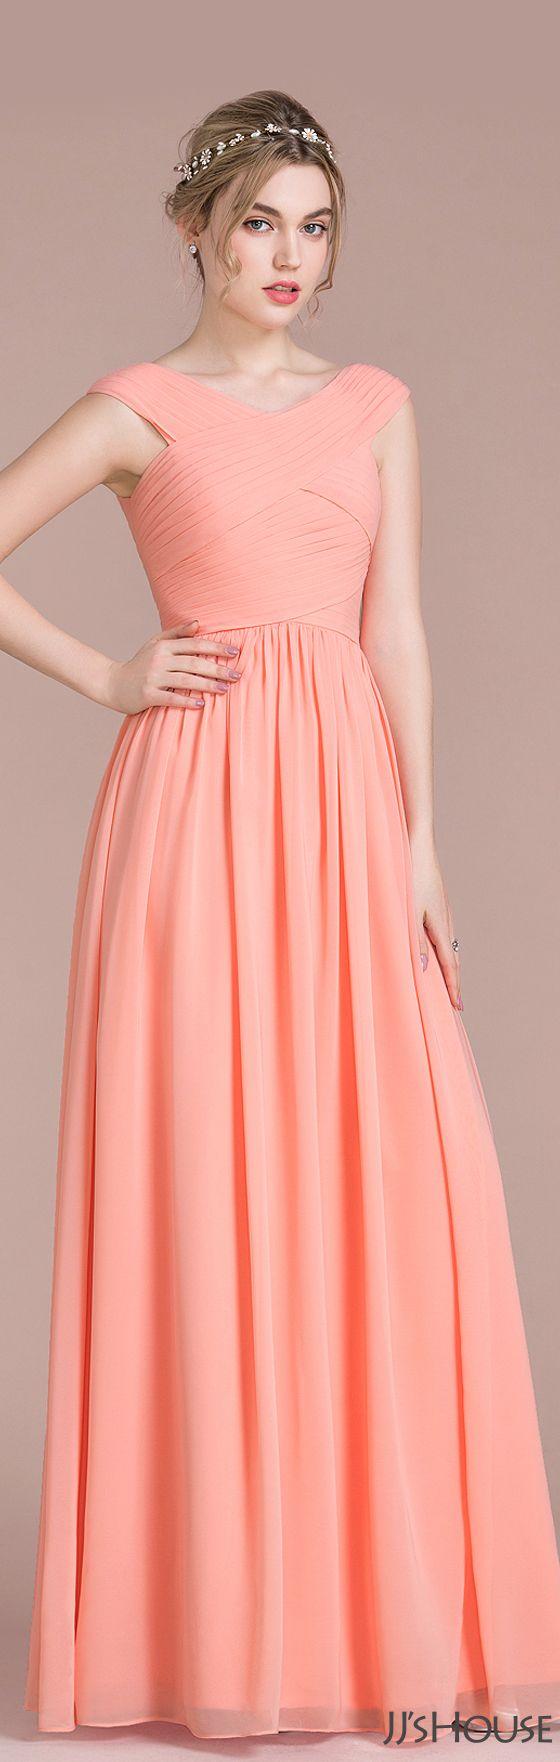 JJsHouse #Bridesmaid | Dresses | Pinterest | Vestiditos, Vestidos de ...